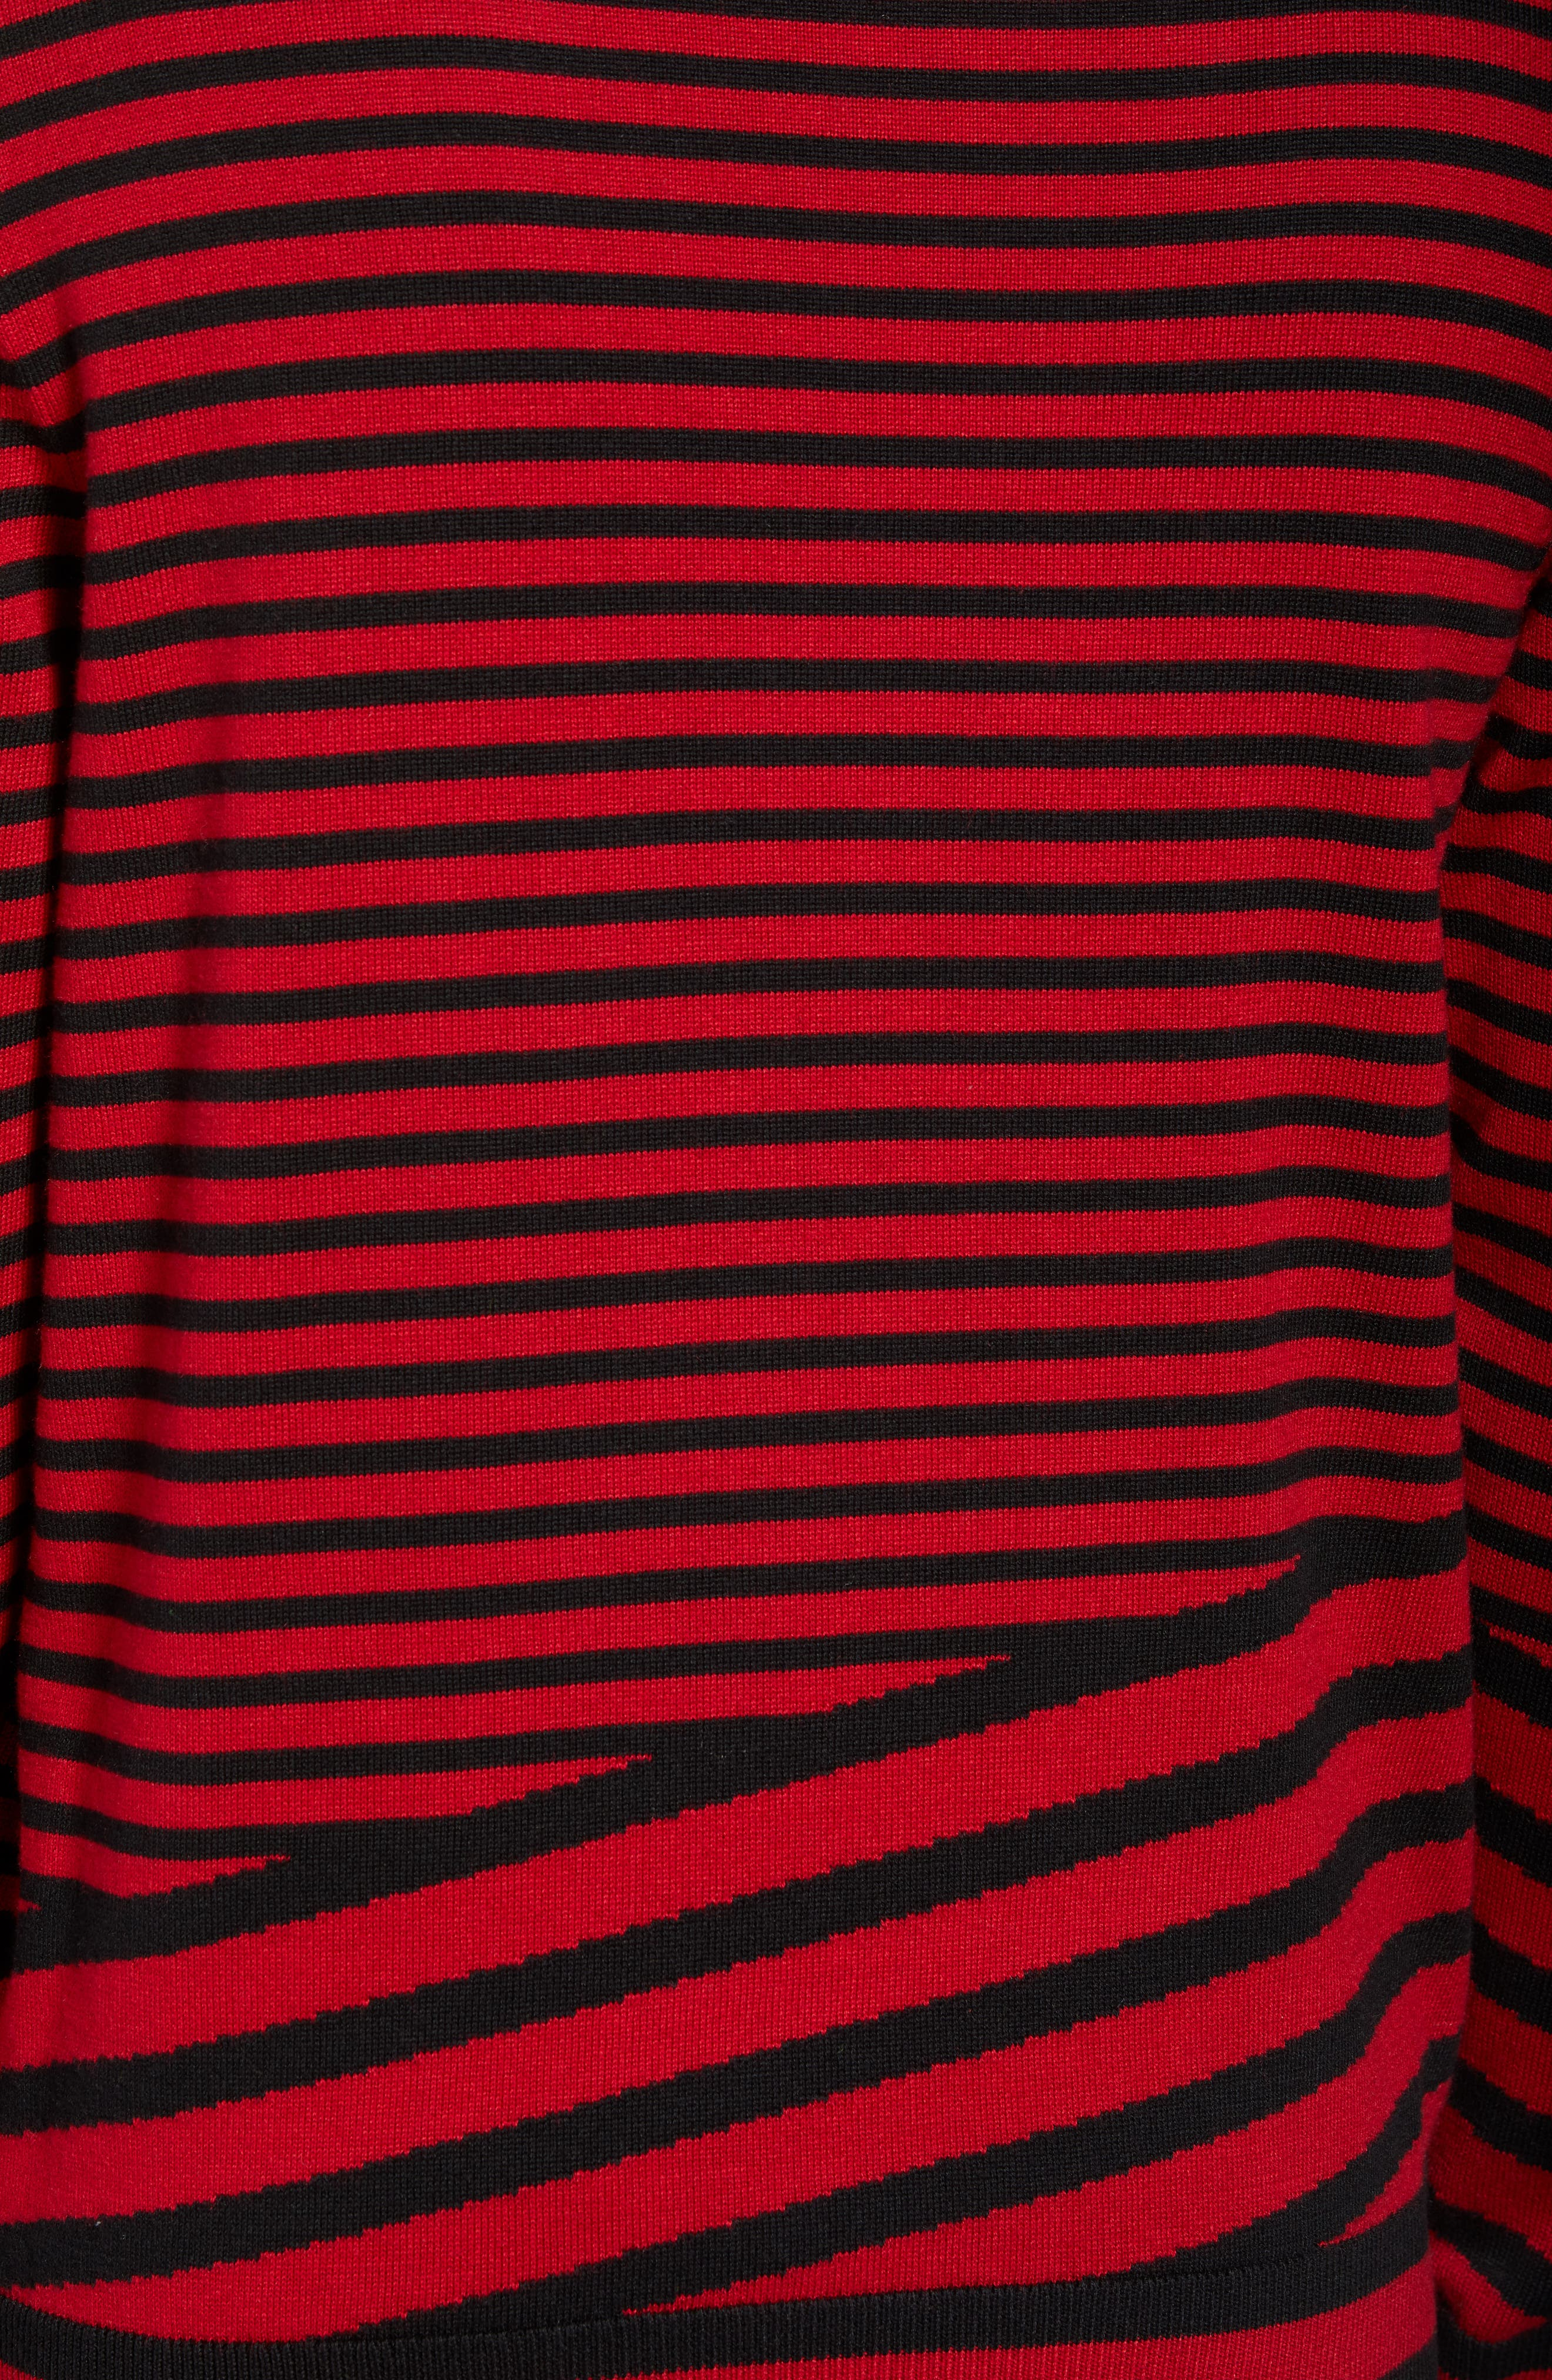 Asymmetrical Stripe Longline Sweater,                             Alternate thumbnail 5, color,                             RED BLACK RETRO STRIPE